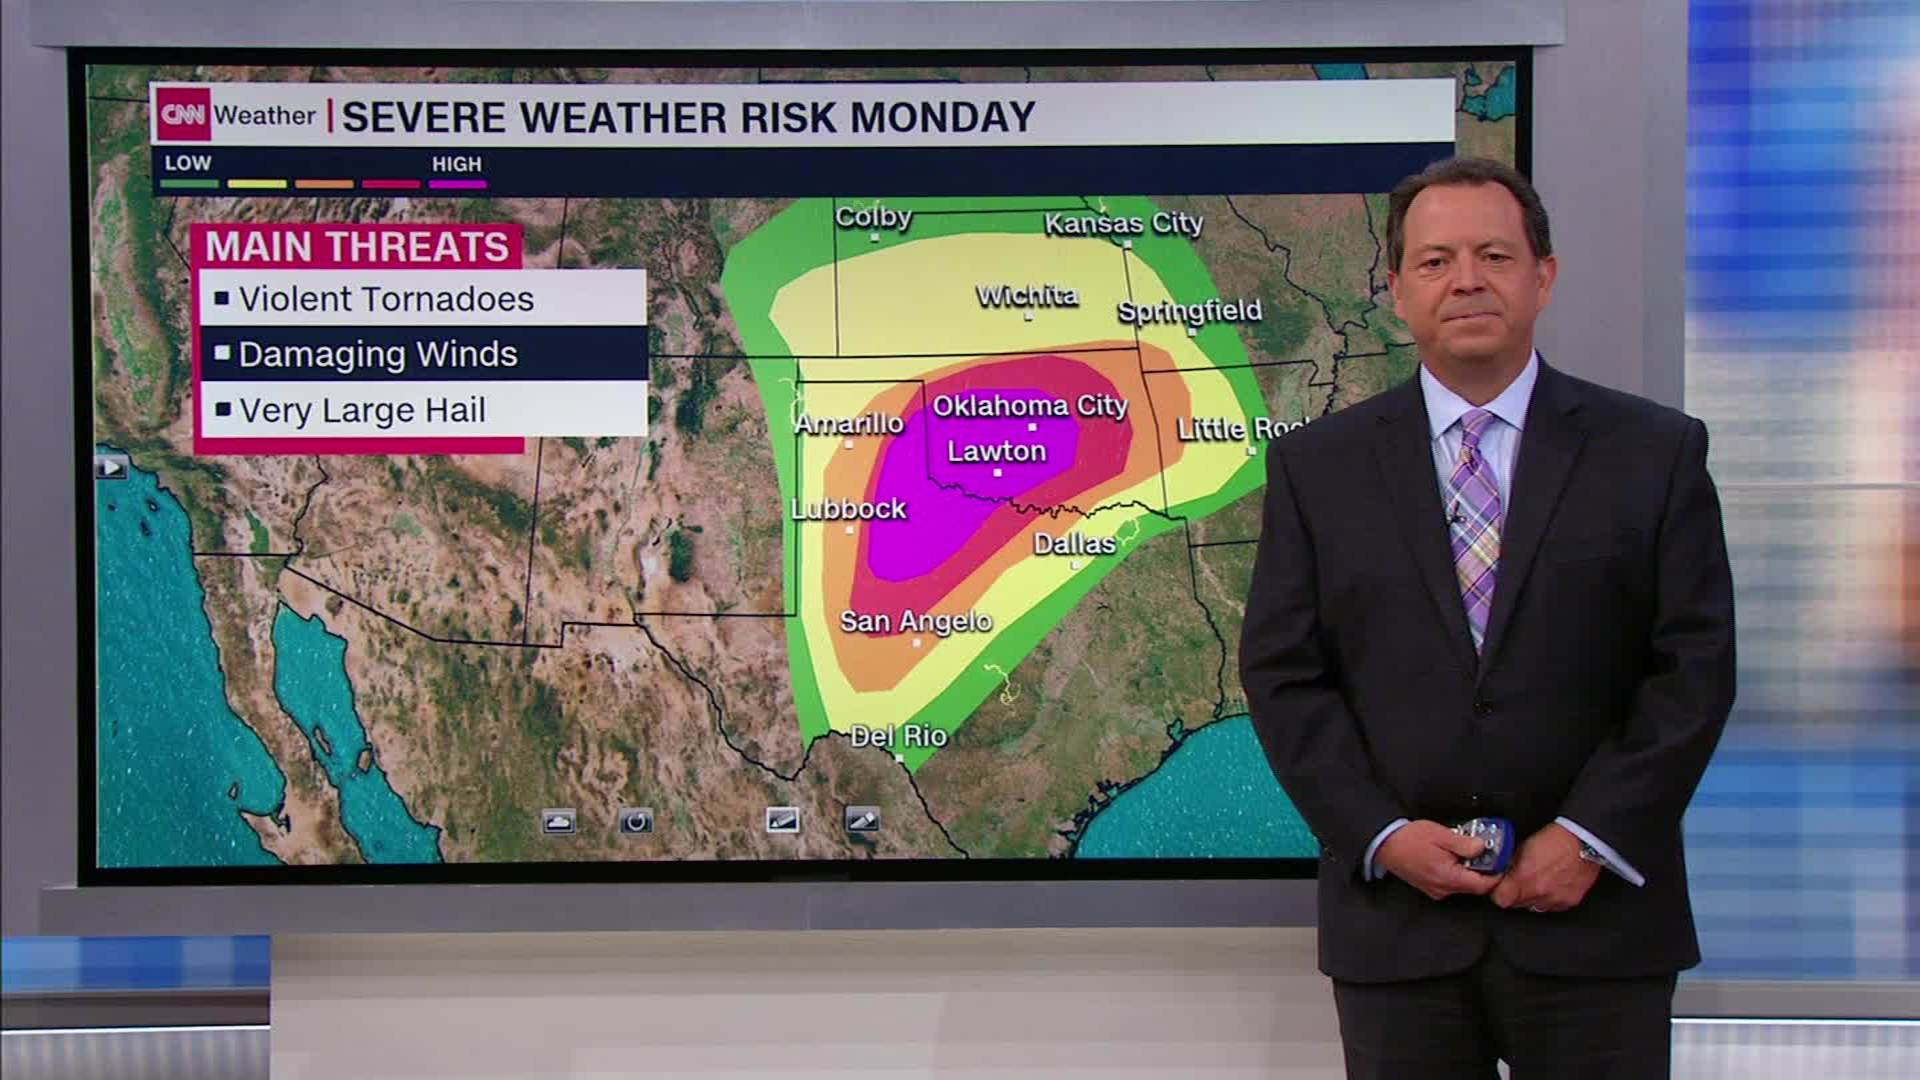 Severe weather heading toward Texas and Oklahoma - CNN Video on lightning maps, harris county maps, climate change maps, jet stream forecast maps, traveling maps, sports maps, severe weather history maps, air pollution maps, wind forecast maps, temperature forecast maps, el nino forecast maps, winter forecast maps,